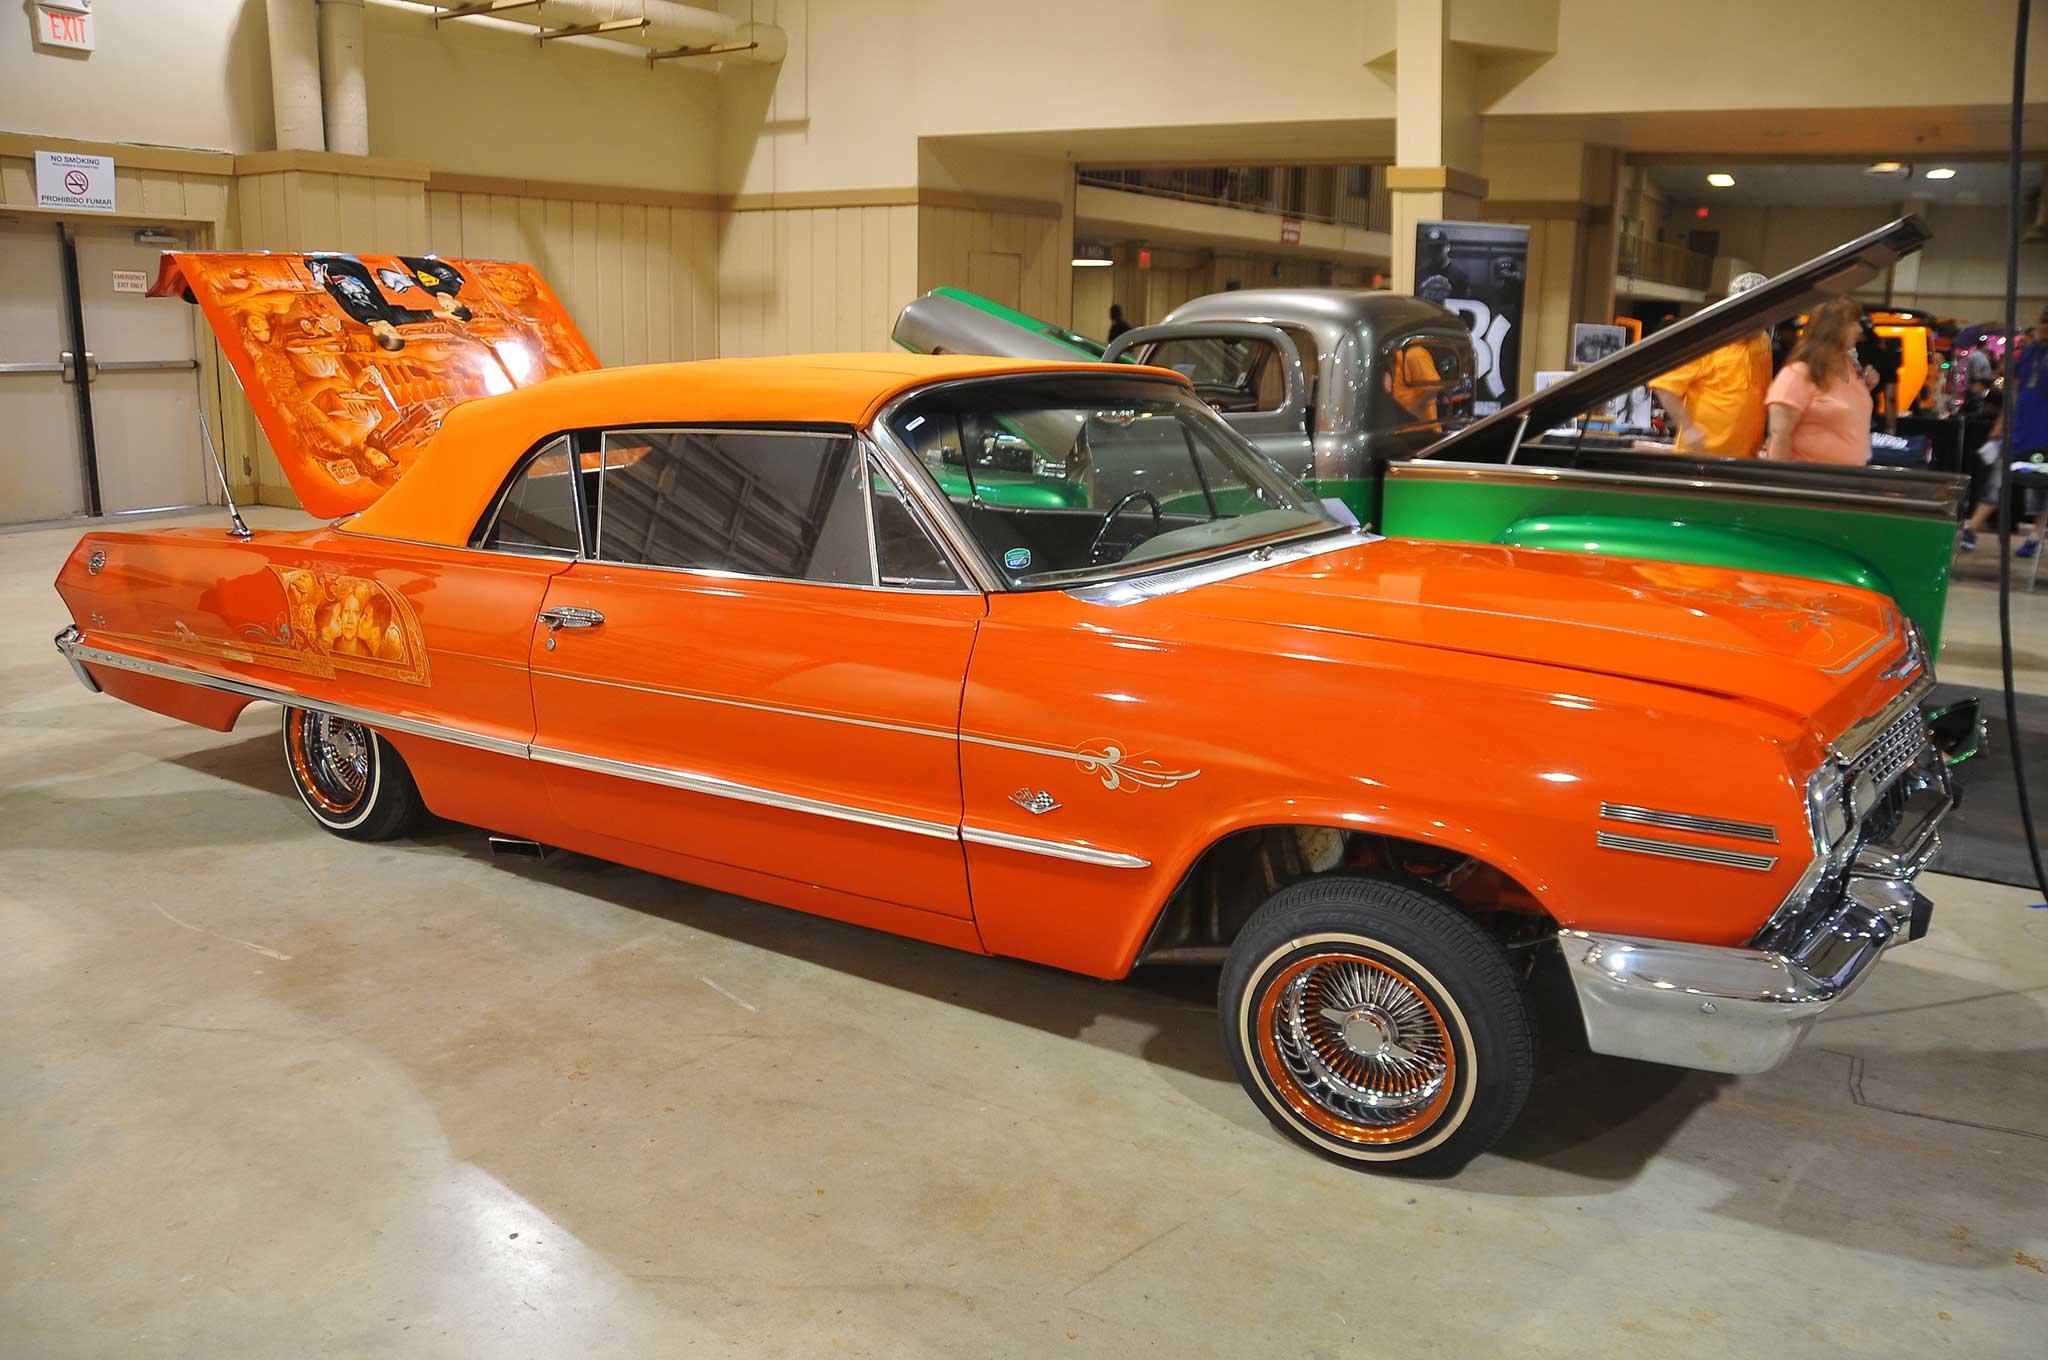 Miami Lowrider Super Show Orange Impala